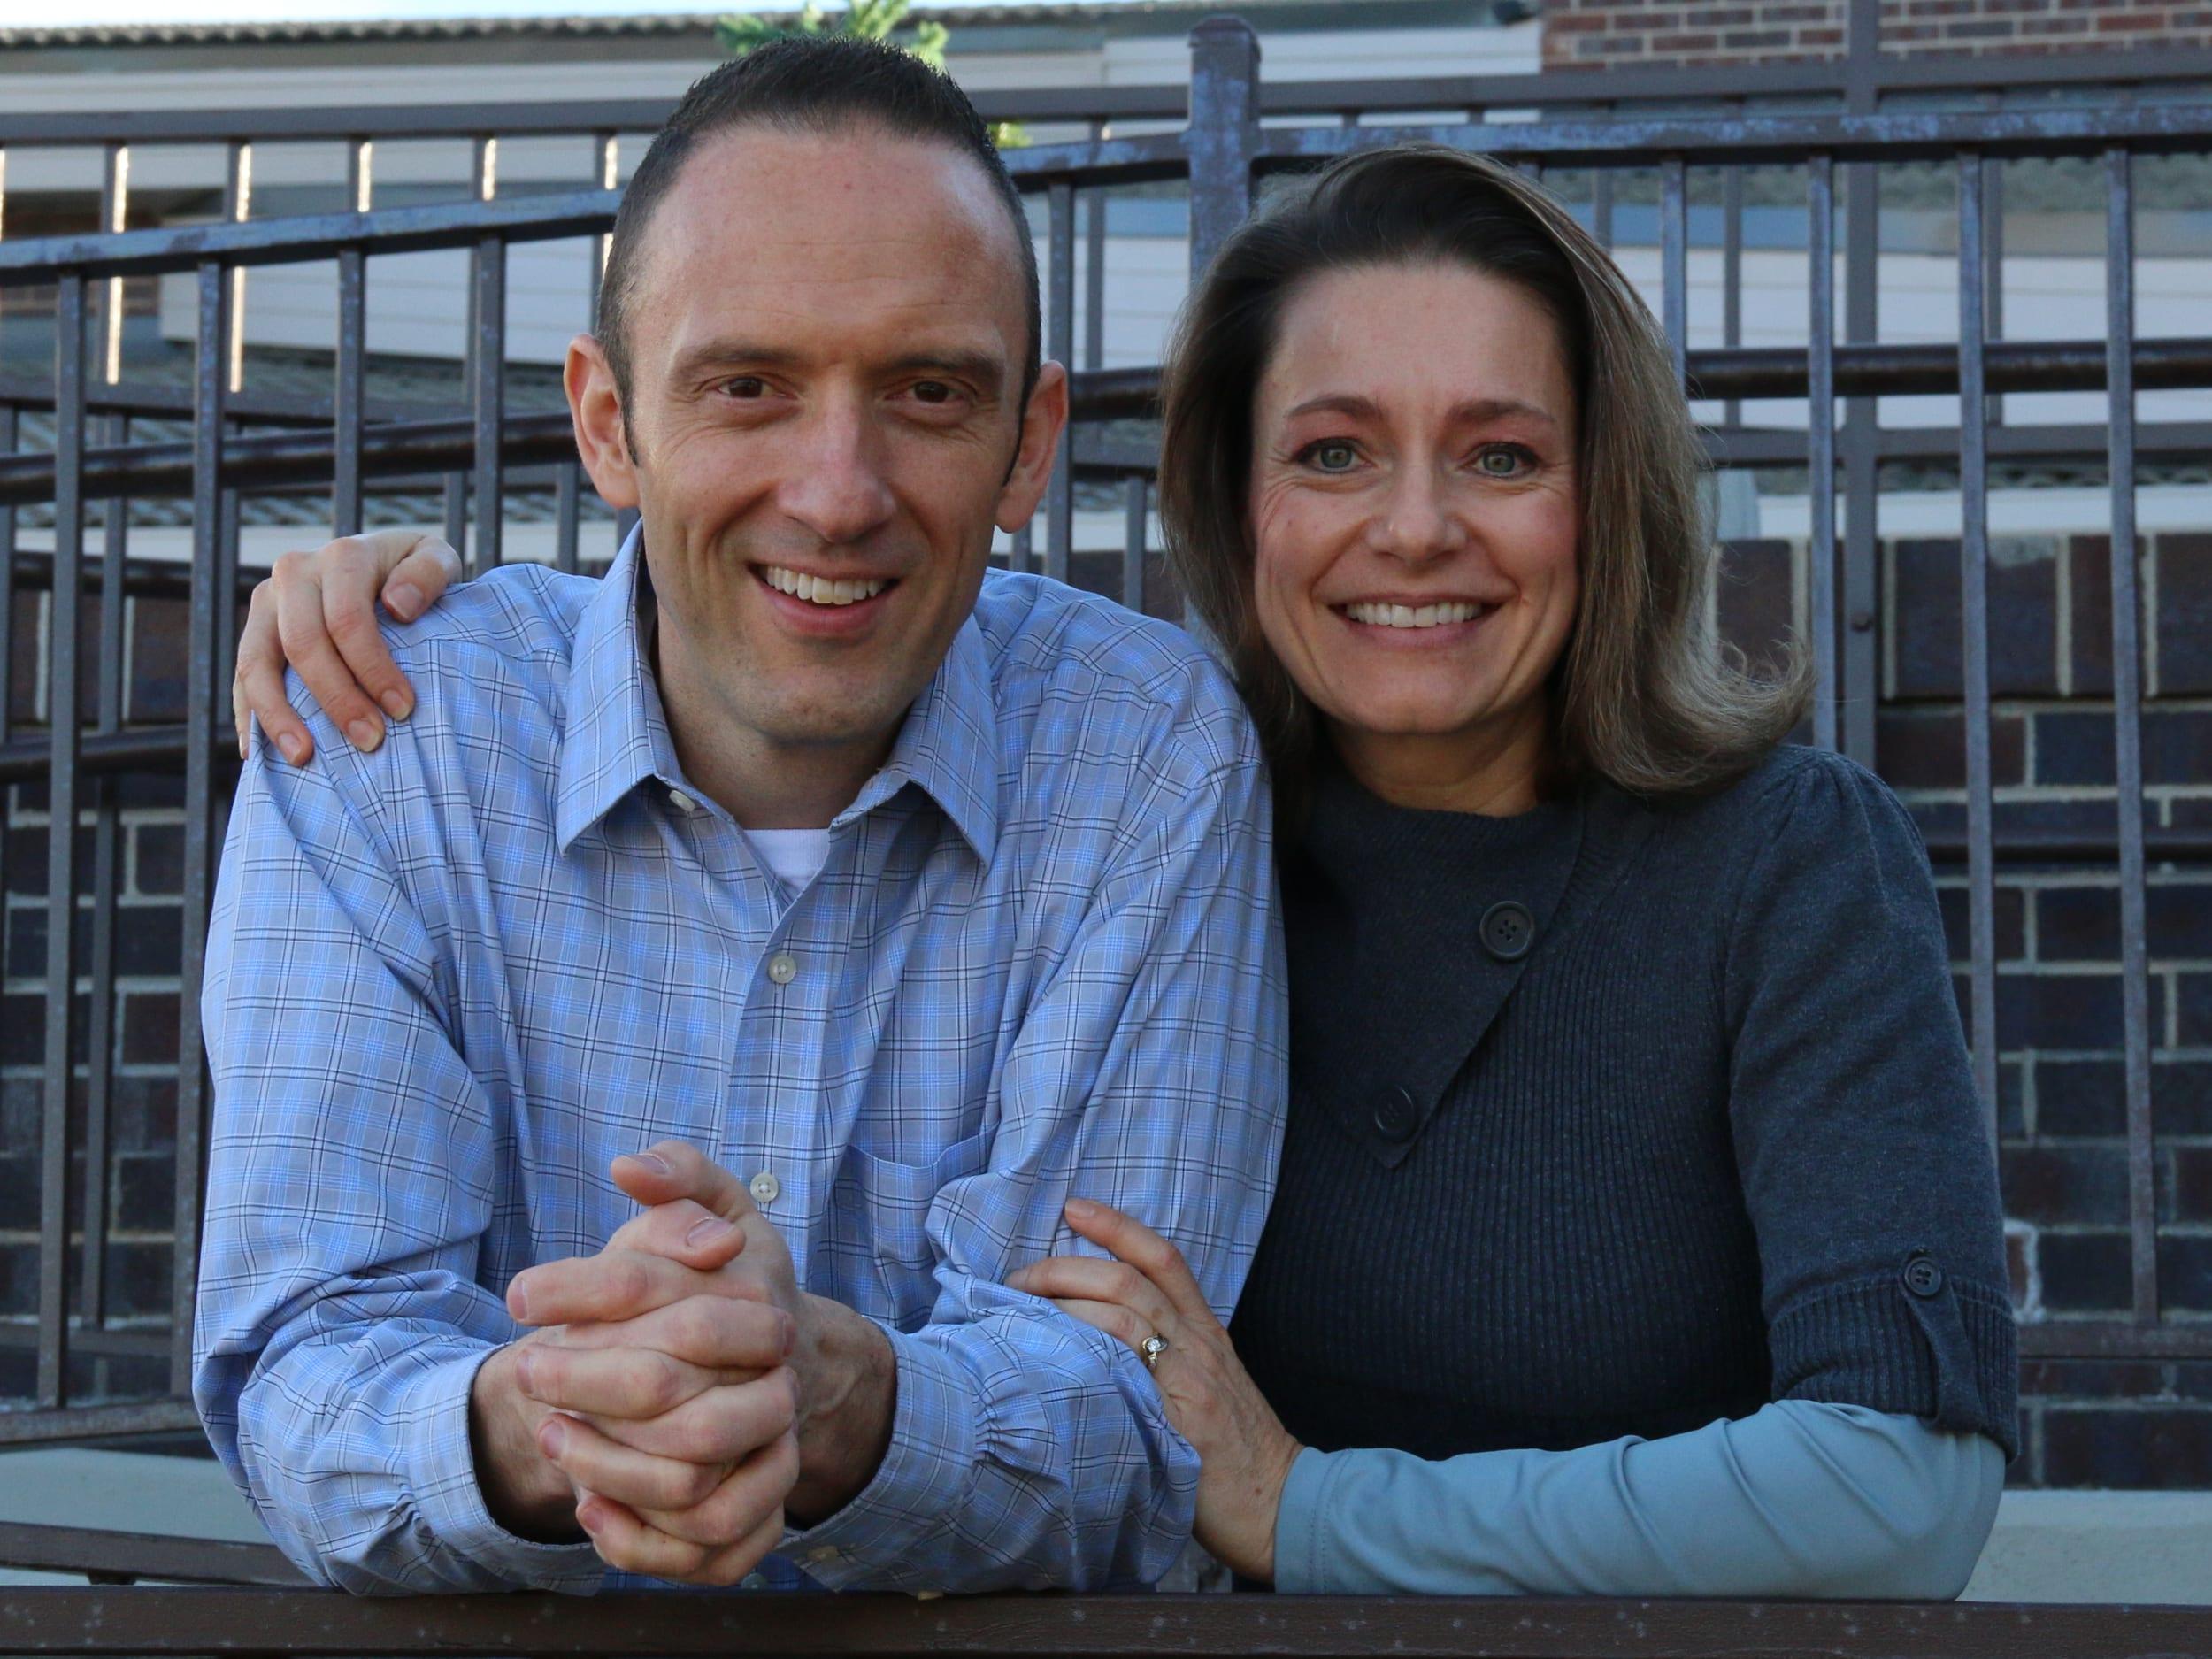 Mike-and-Jill-Roncaglia.jpg